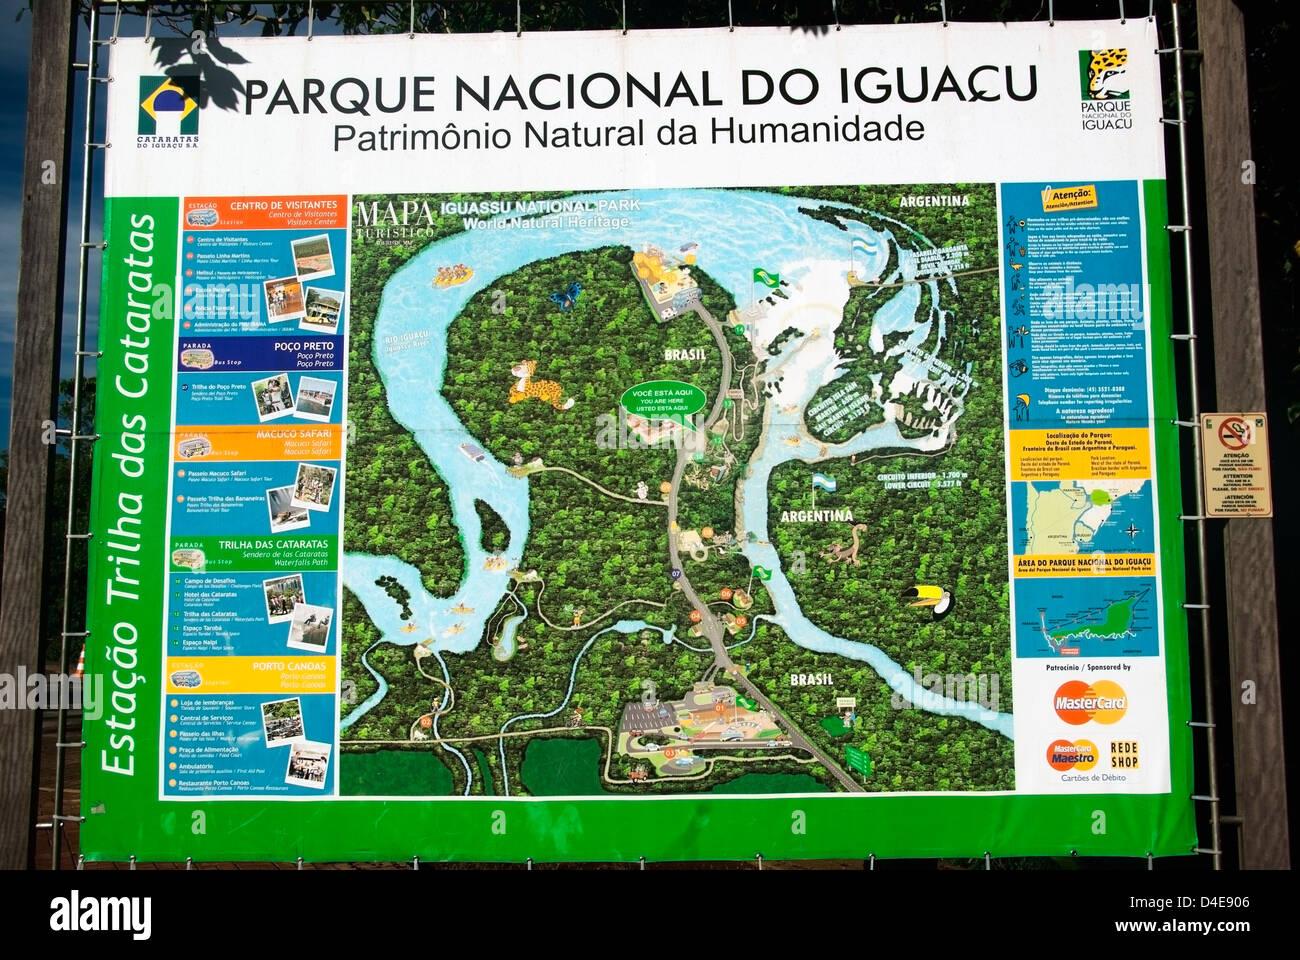 Sign for iguacu national parkh close up of map curitiba paranaj sign for iguacu national parkh close up of map curitiba paranaj brazil gumiabroncs Images